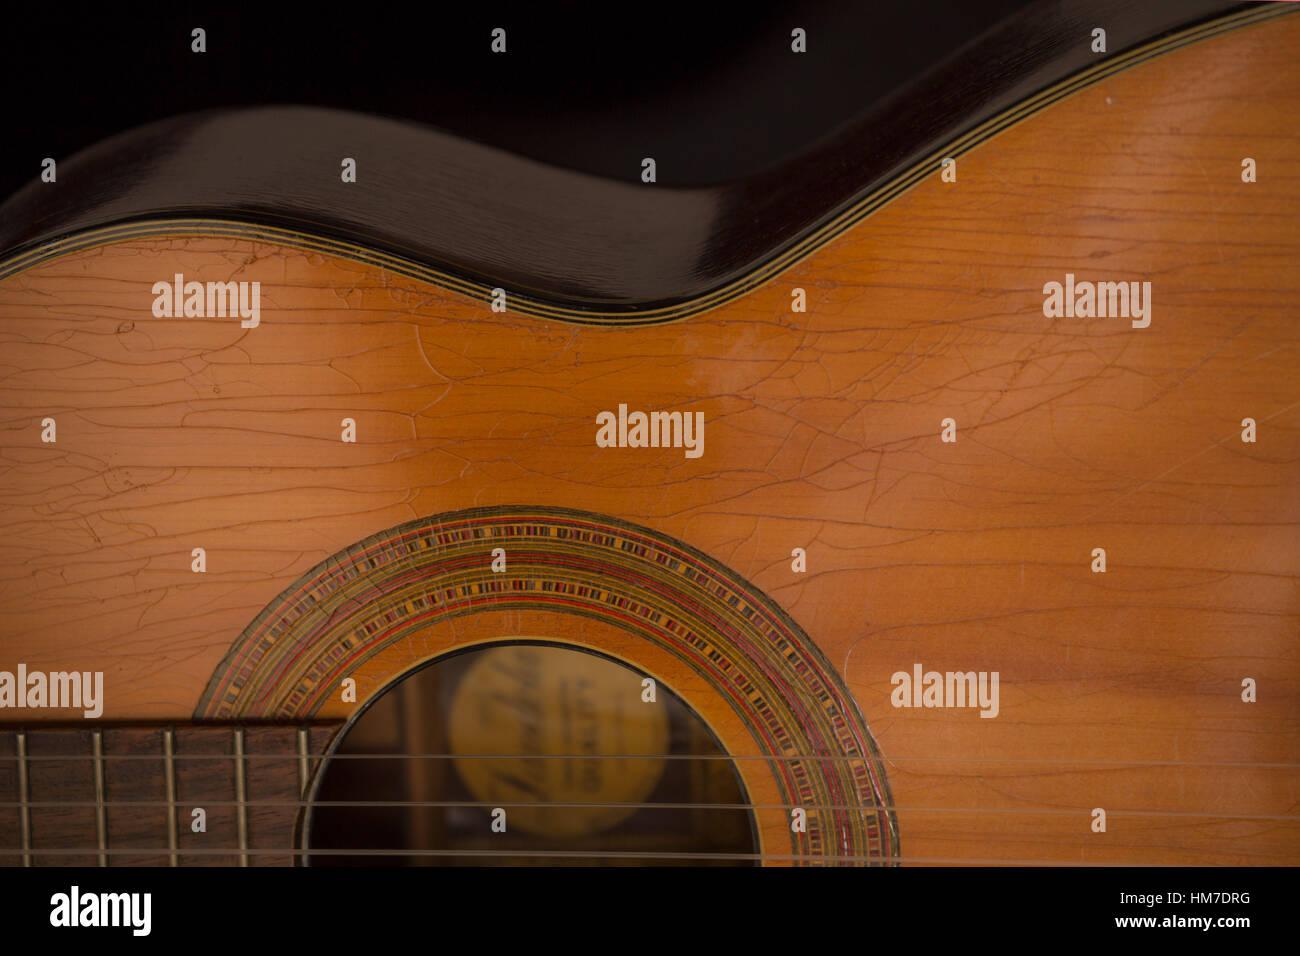 acoustic,art,audio,background,black,blues,brown,classic